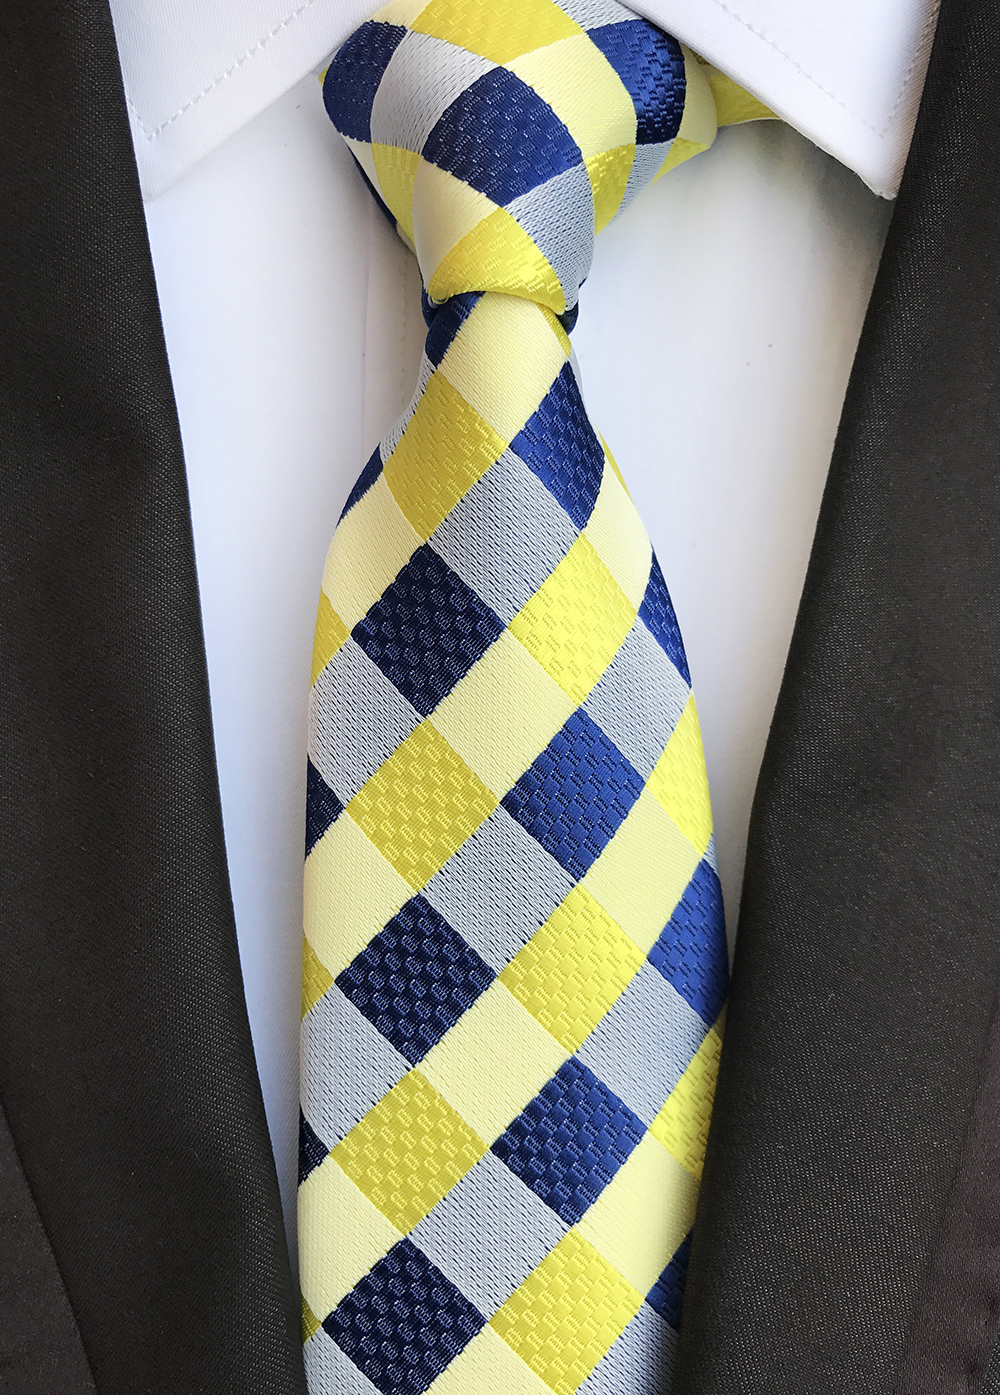 Classic 8cm Ties for Man 100 Silk Tie Luxury Striped Plaid Checks Business Neck Tie for Men Suit Cravat Wedding Party Neckties in Men 39 s Ties amp Handkerchiefs from Apparel Accessories